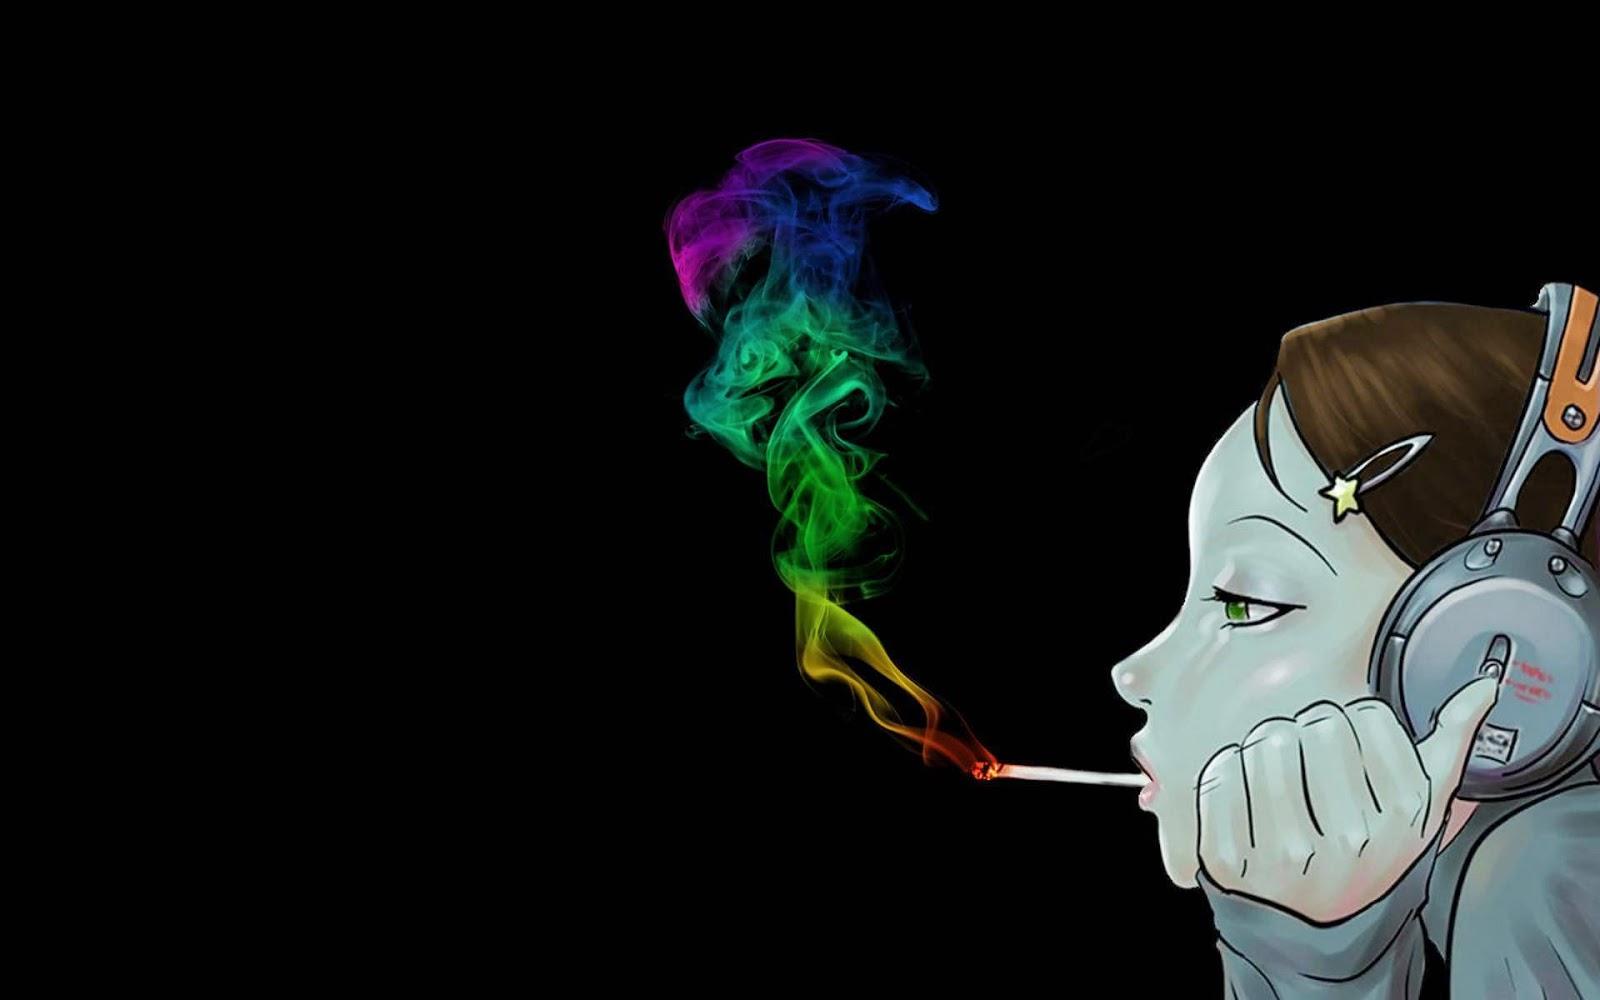 Can marijuana boost your creativity?